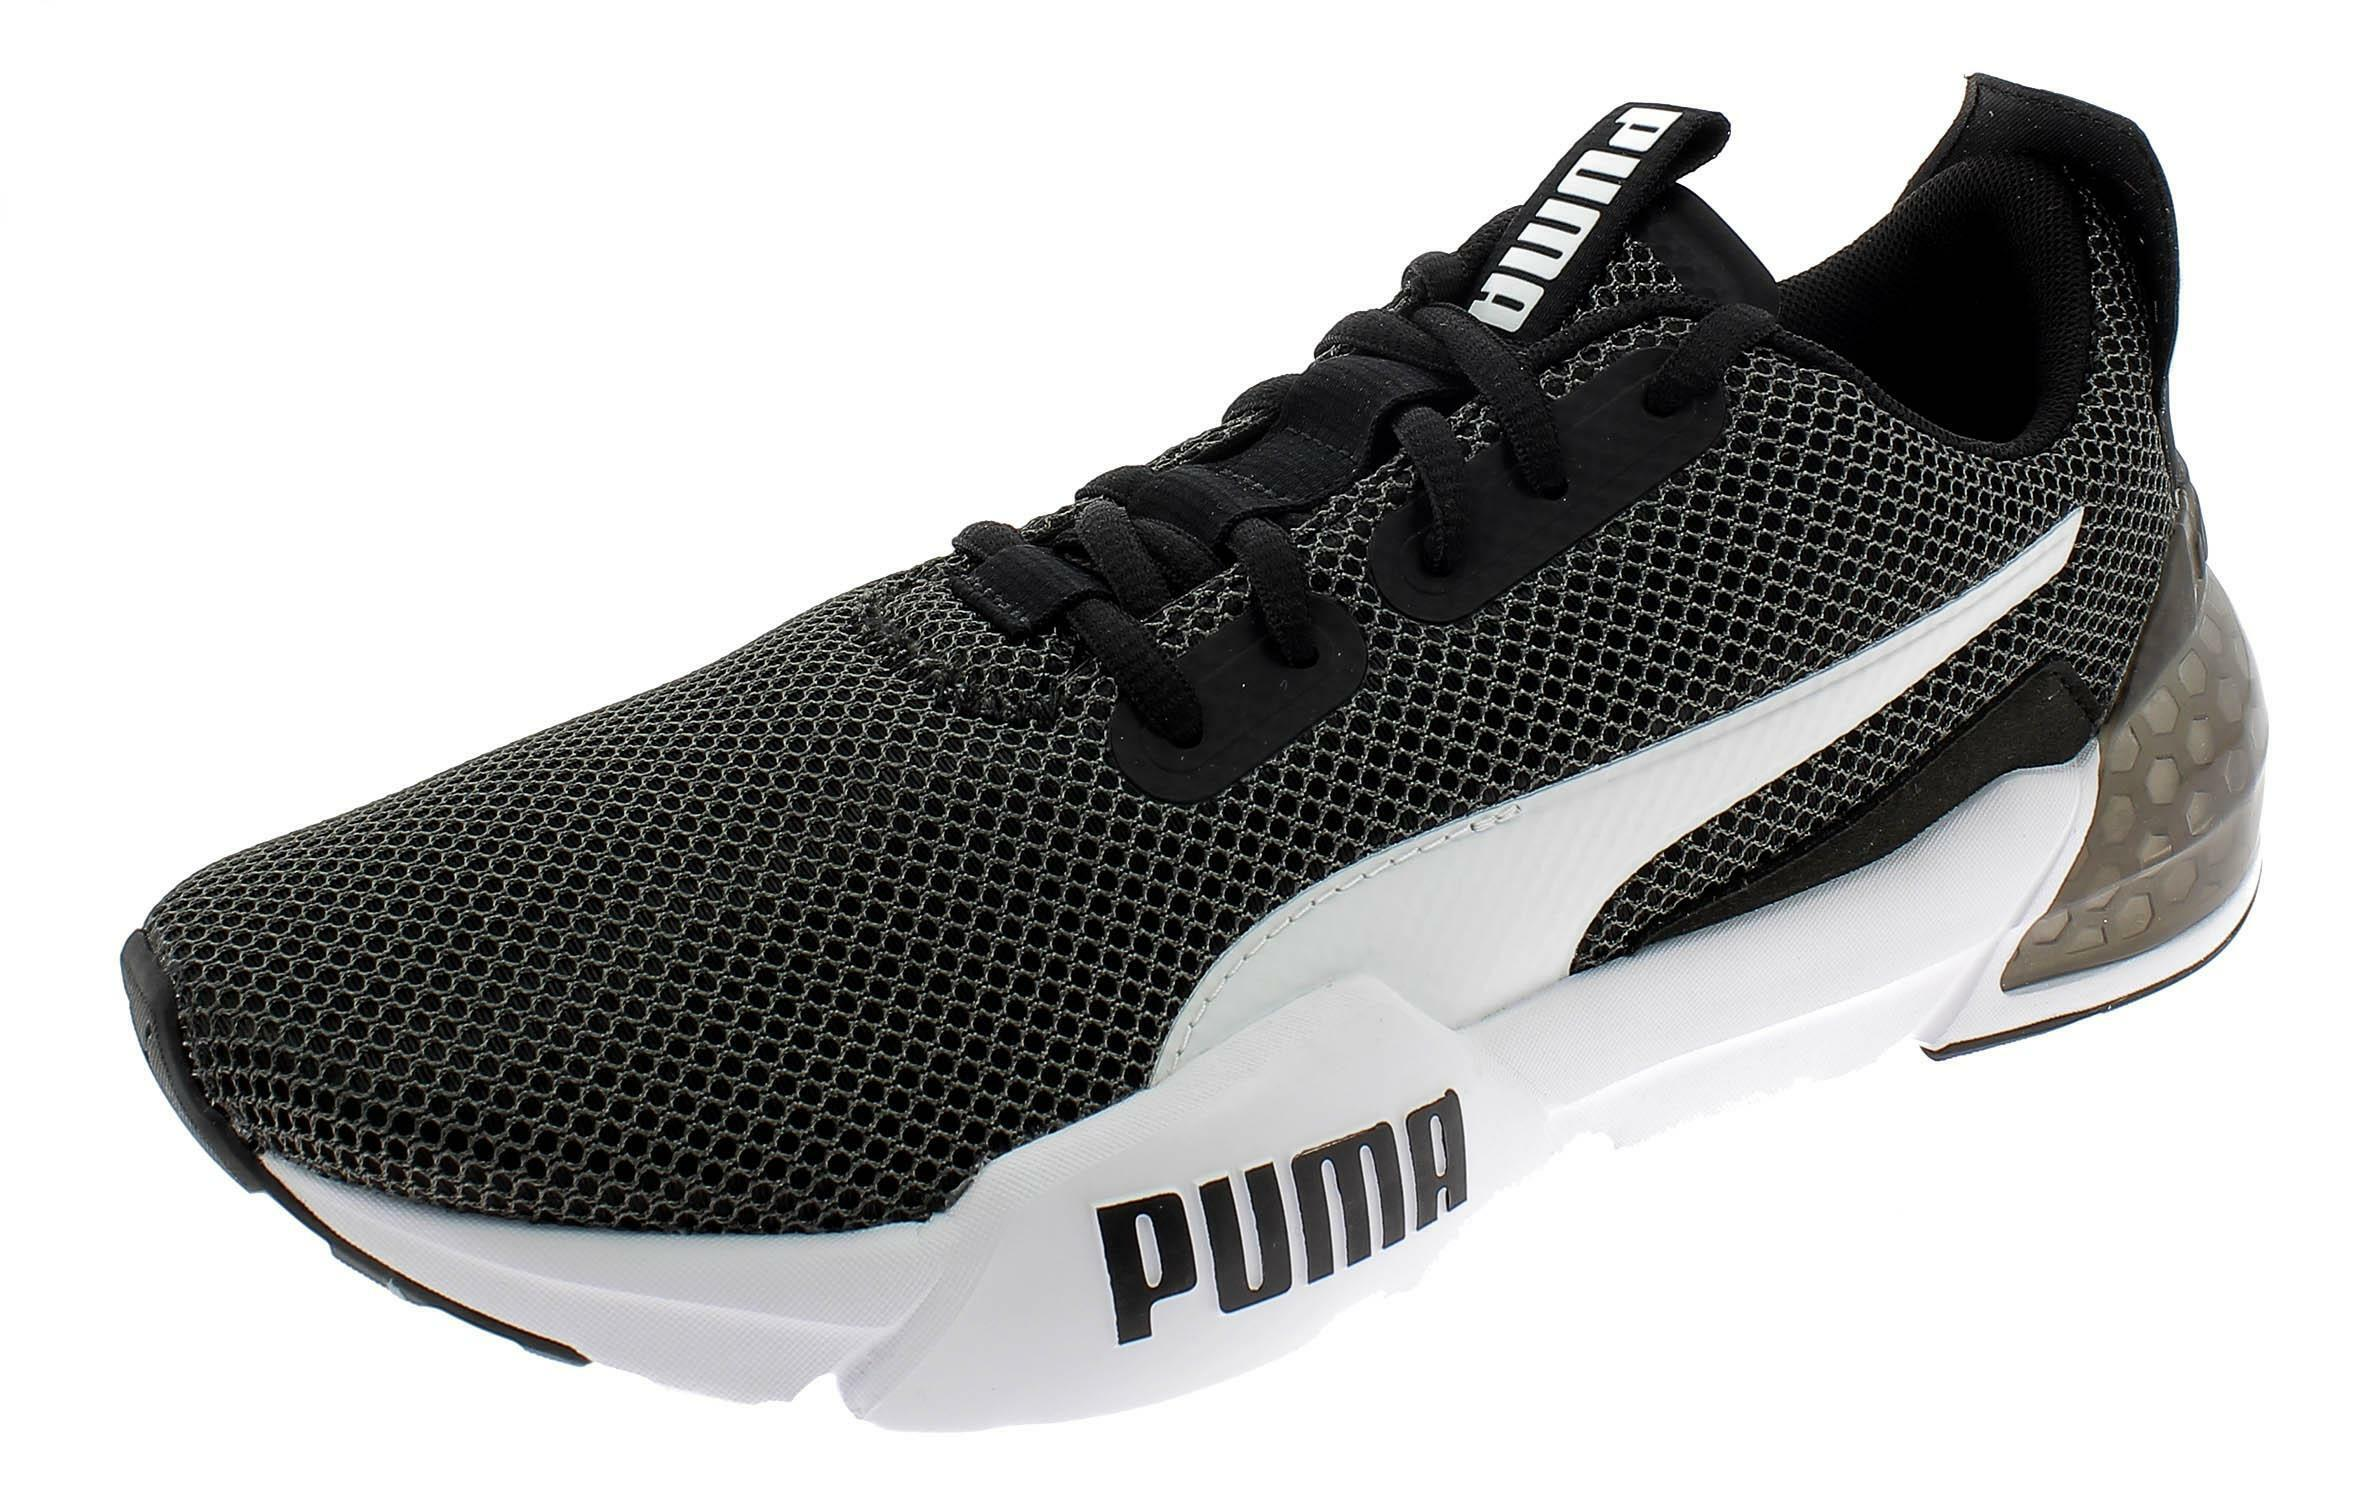 salvare af002 42c22 Puma cell phase scarpe sportive uomo nere 19263802